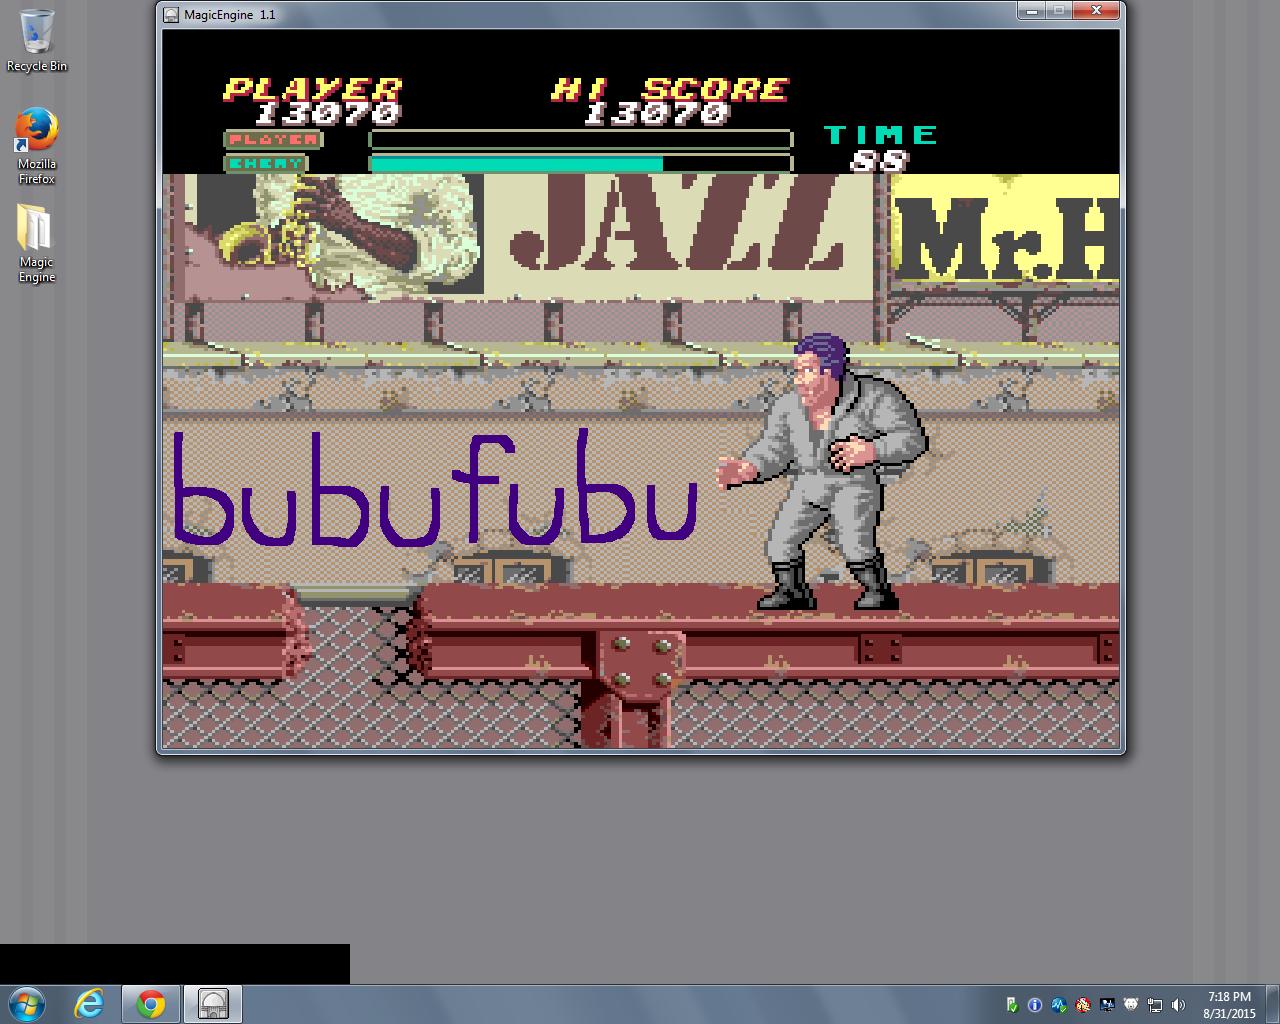 bubufubu: Vigilante (TurboGrafx-16/PC Engine Emulated) 13,070 points on 2015-11-01 09:32:17